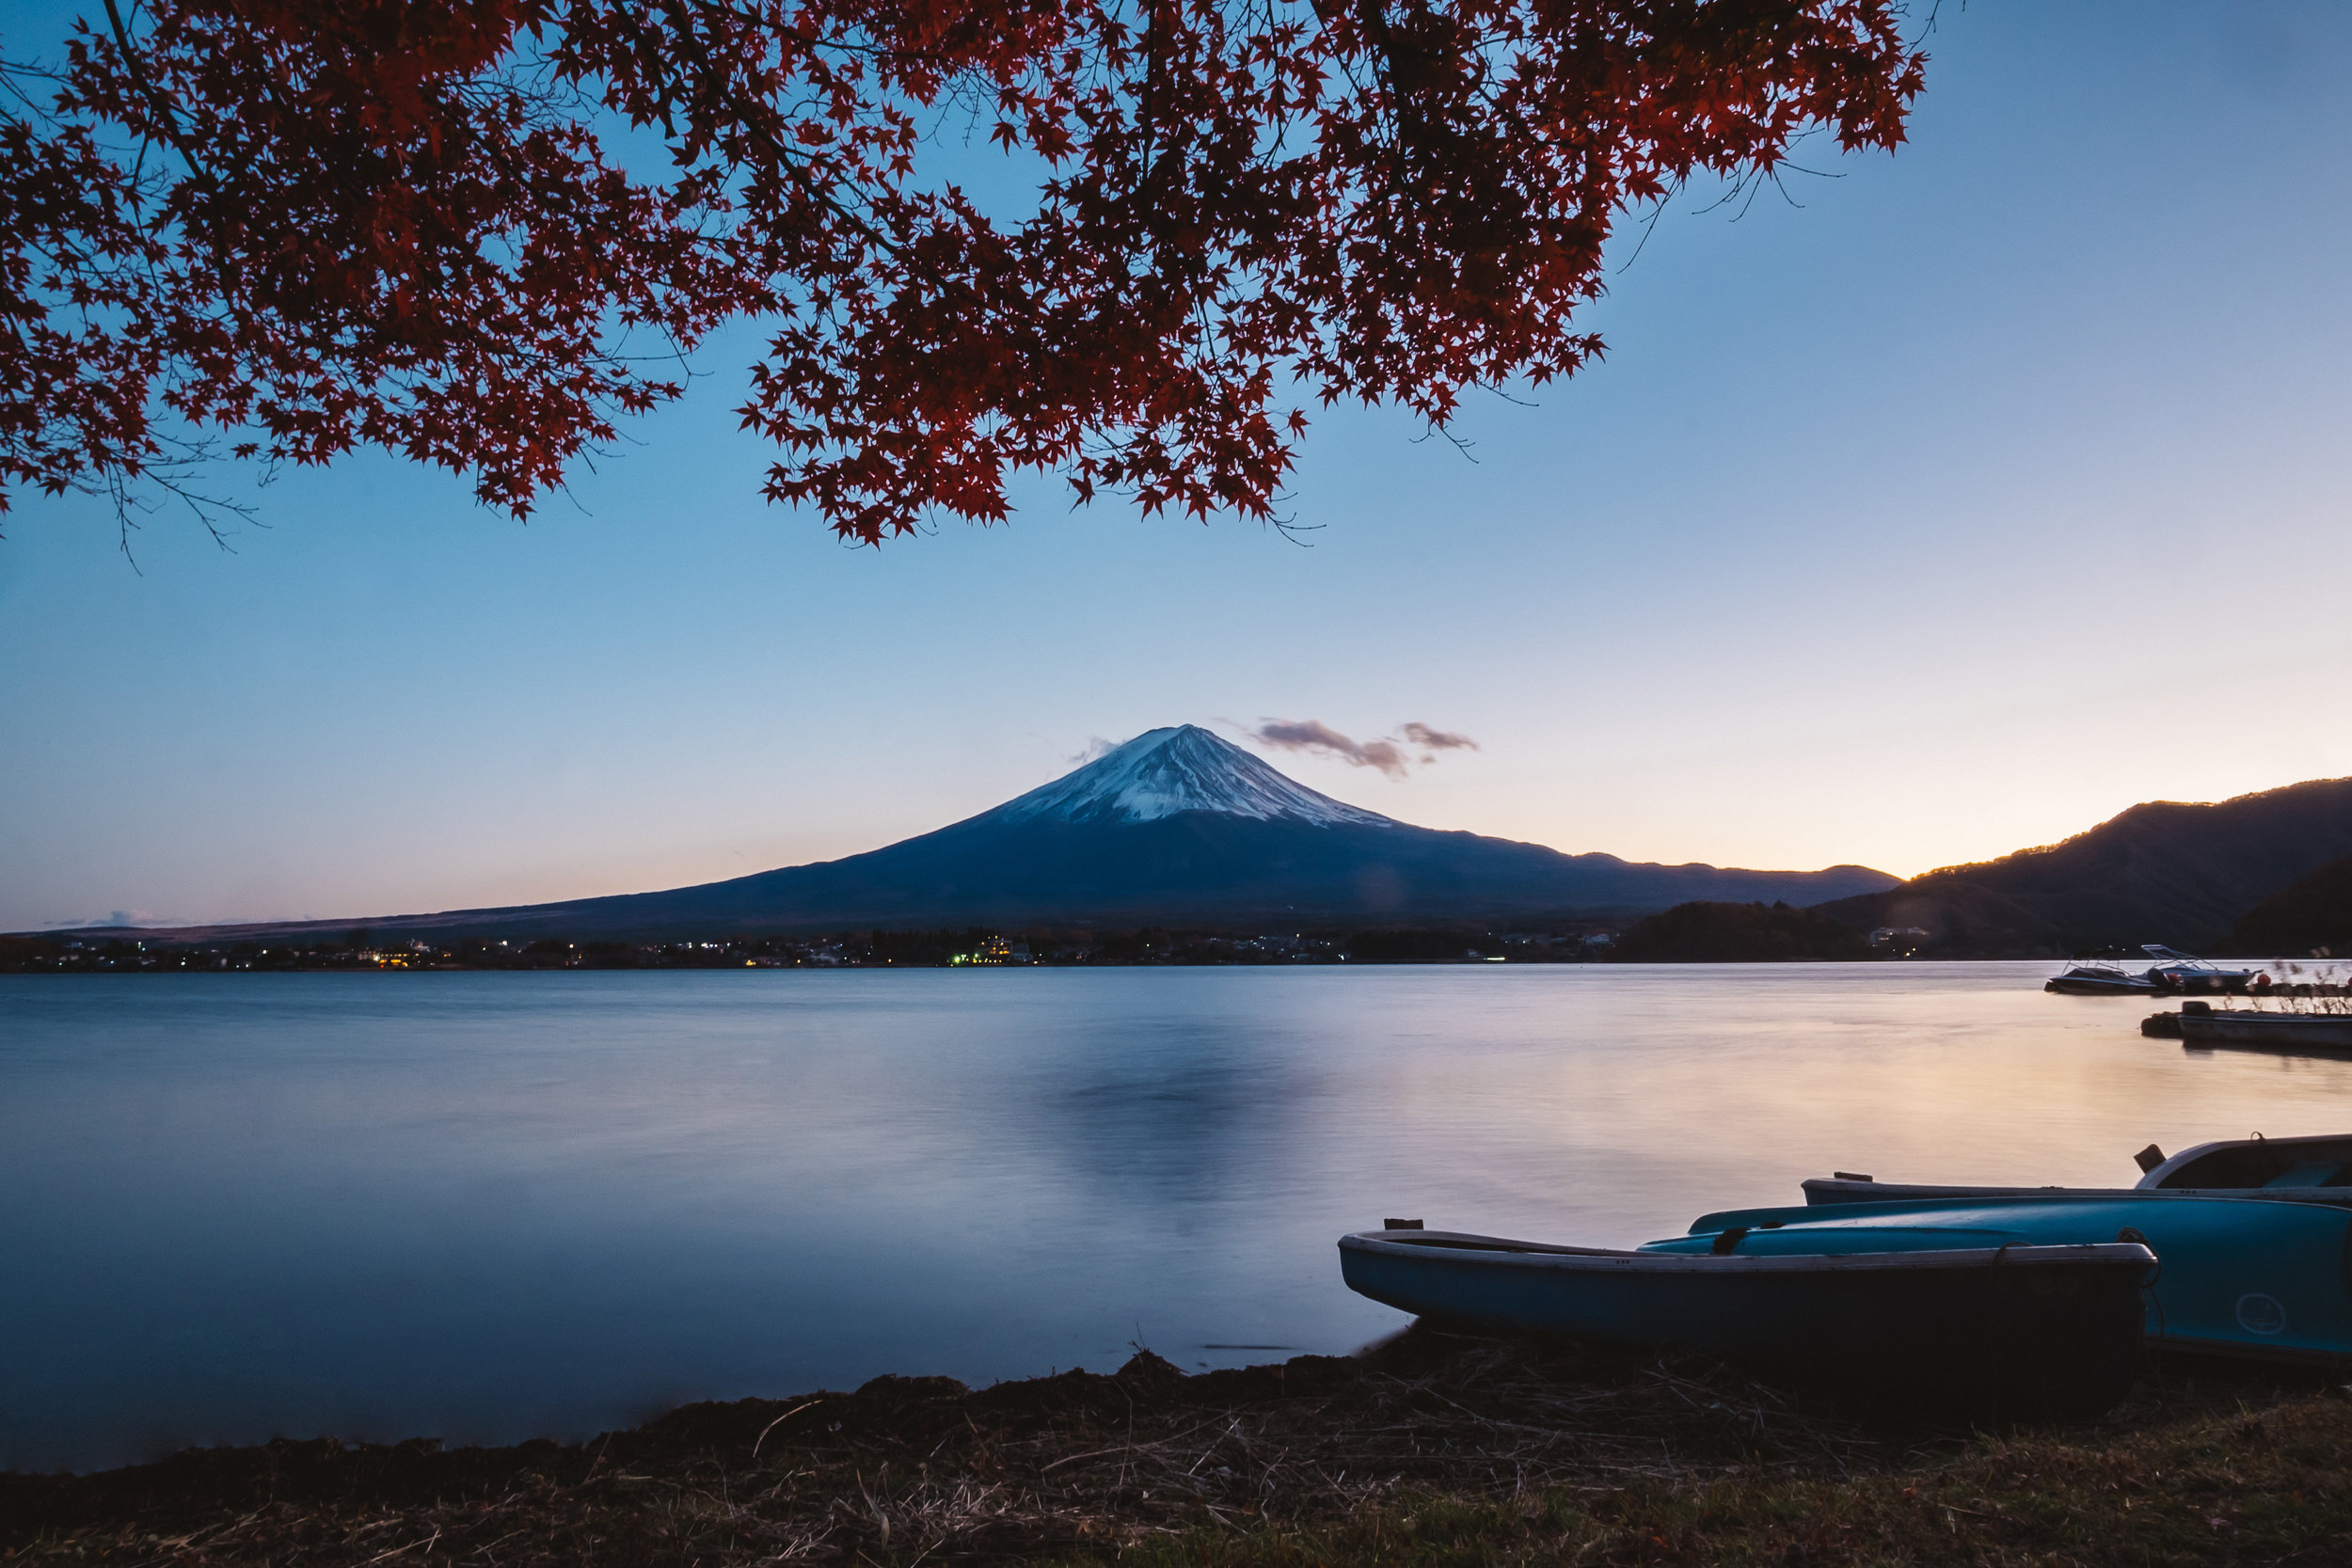 Canva - Mt. Fuji, Japan.jpg